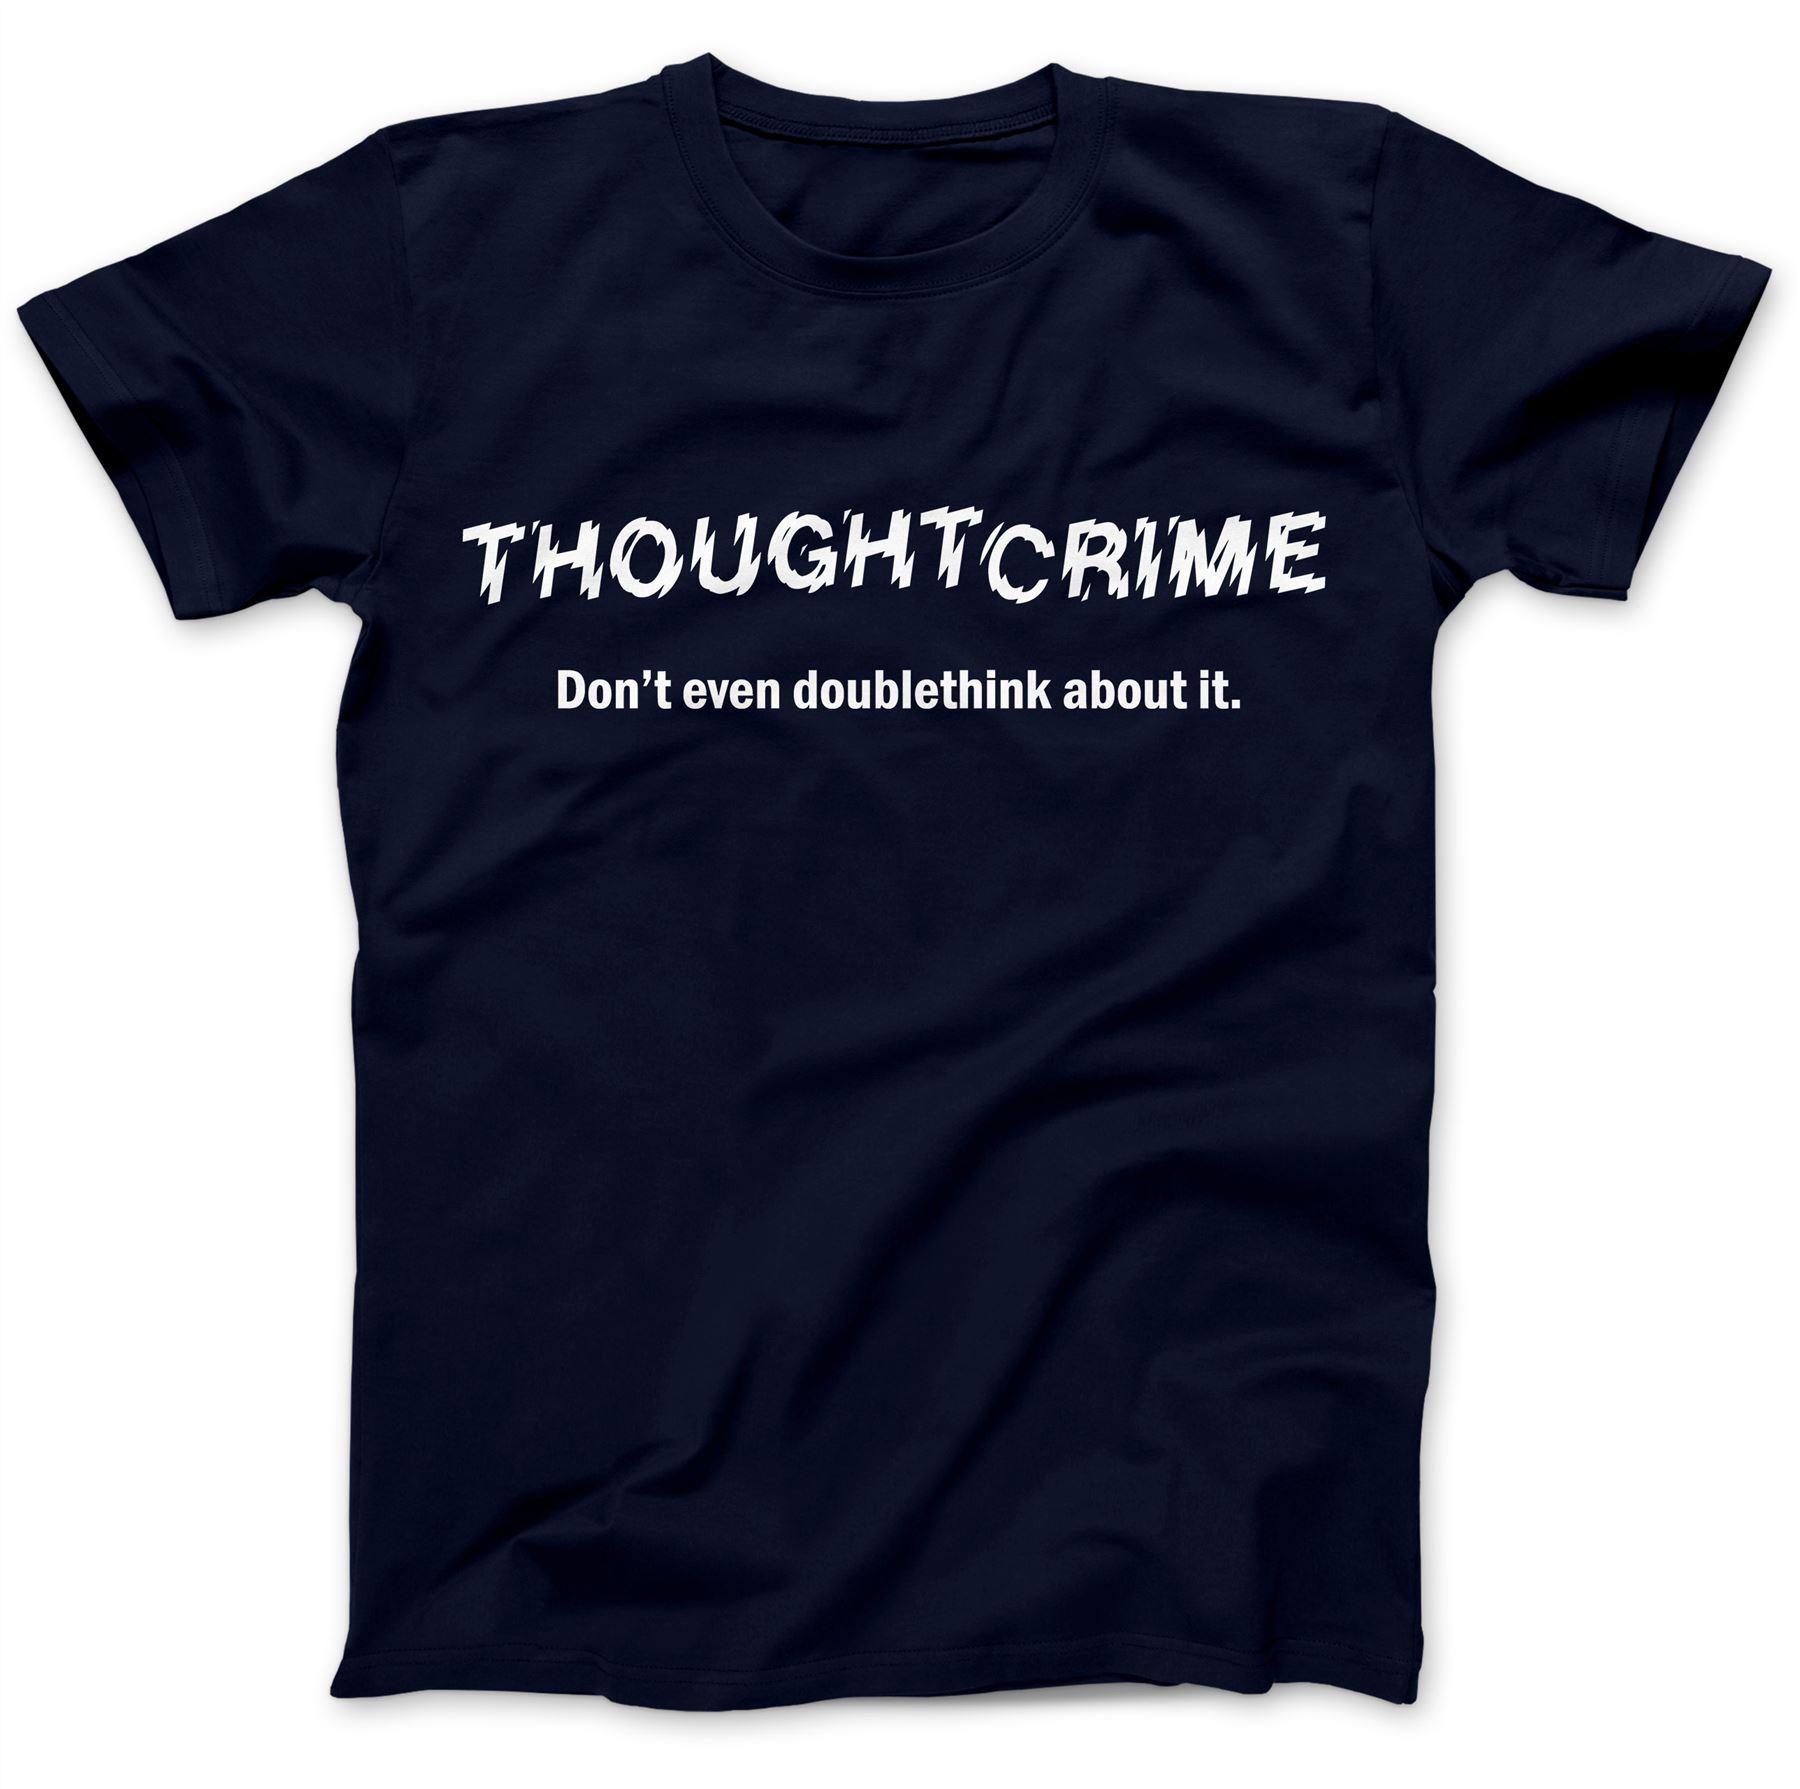 1984-Thought-Crime-George-Orwell-T-Shirt-100-Premium-Cotton-Animal-Farm miniatuur 19